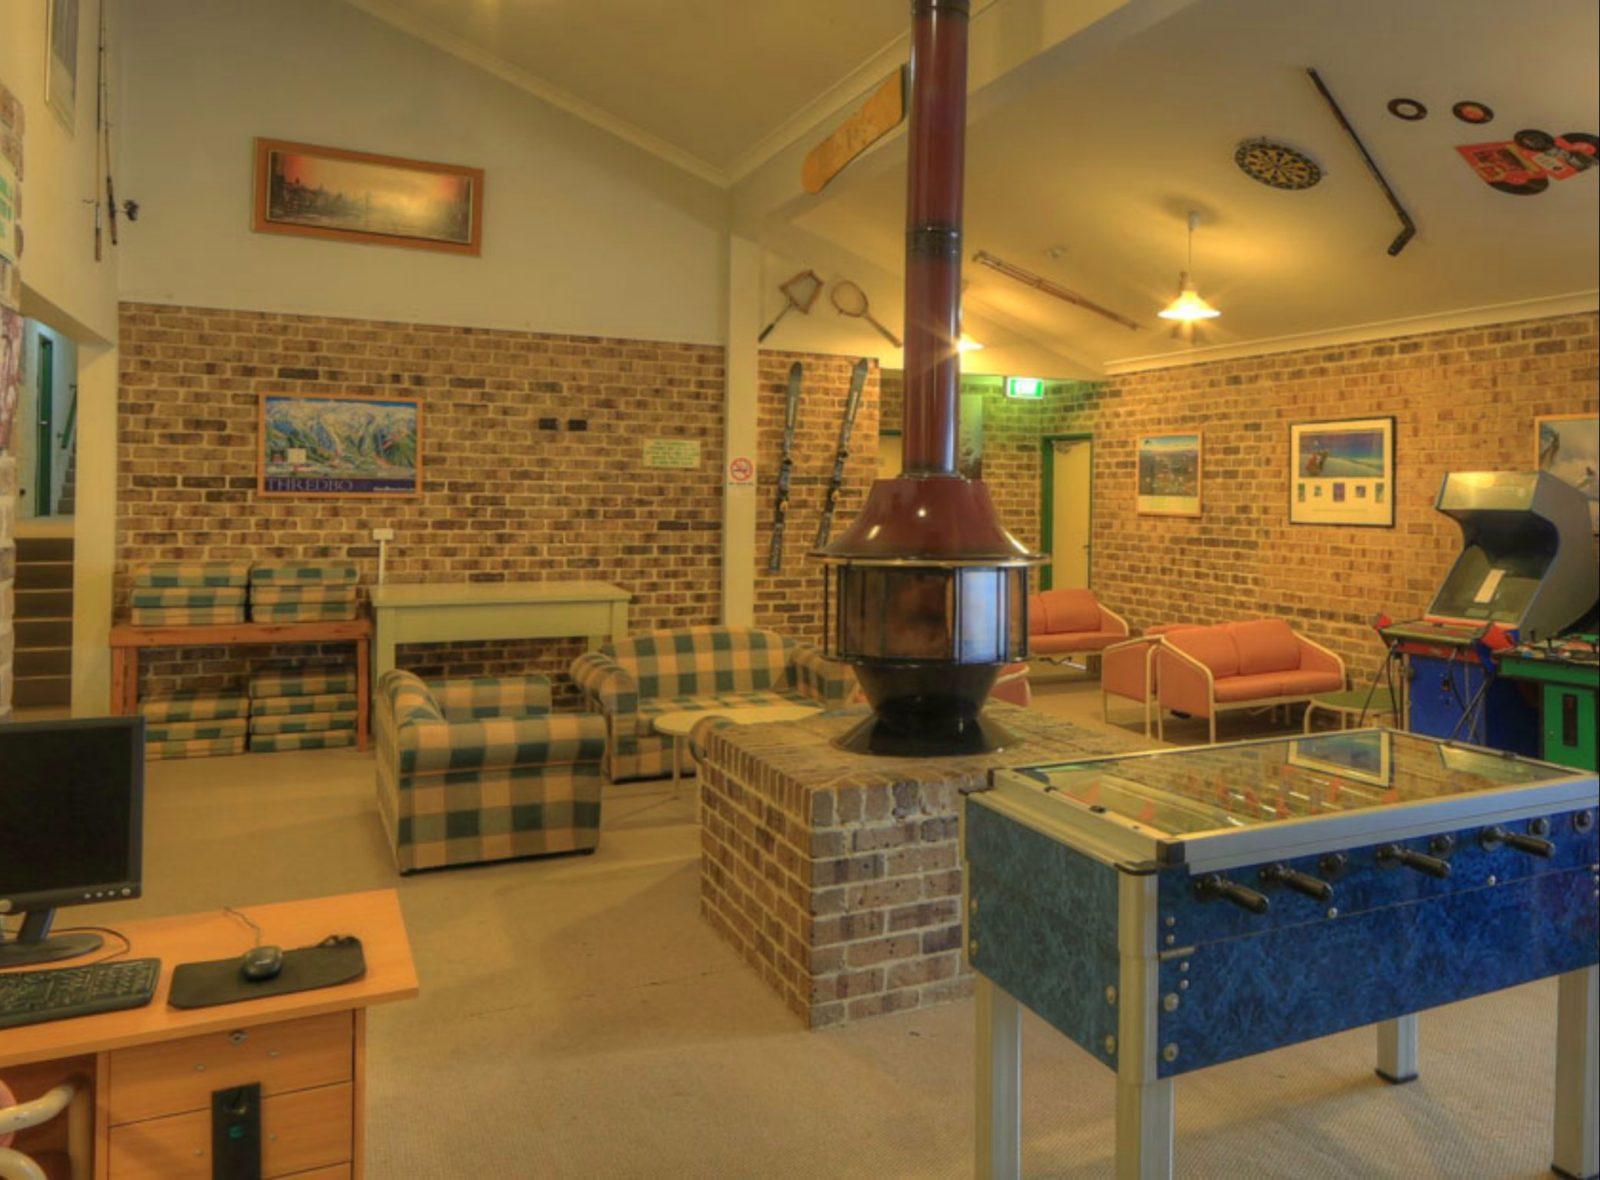 Acacia Snowy Motel